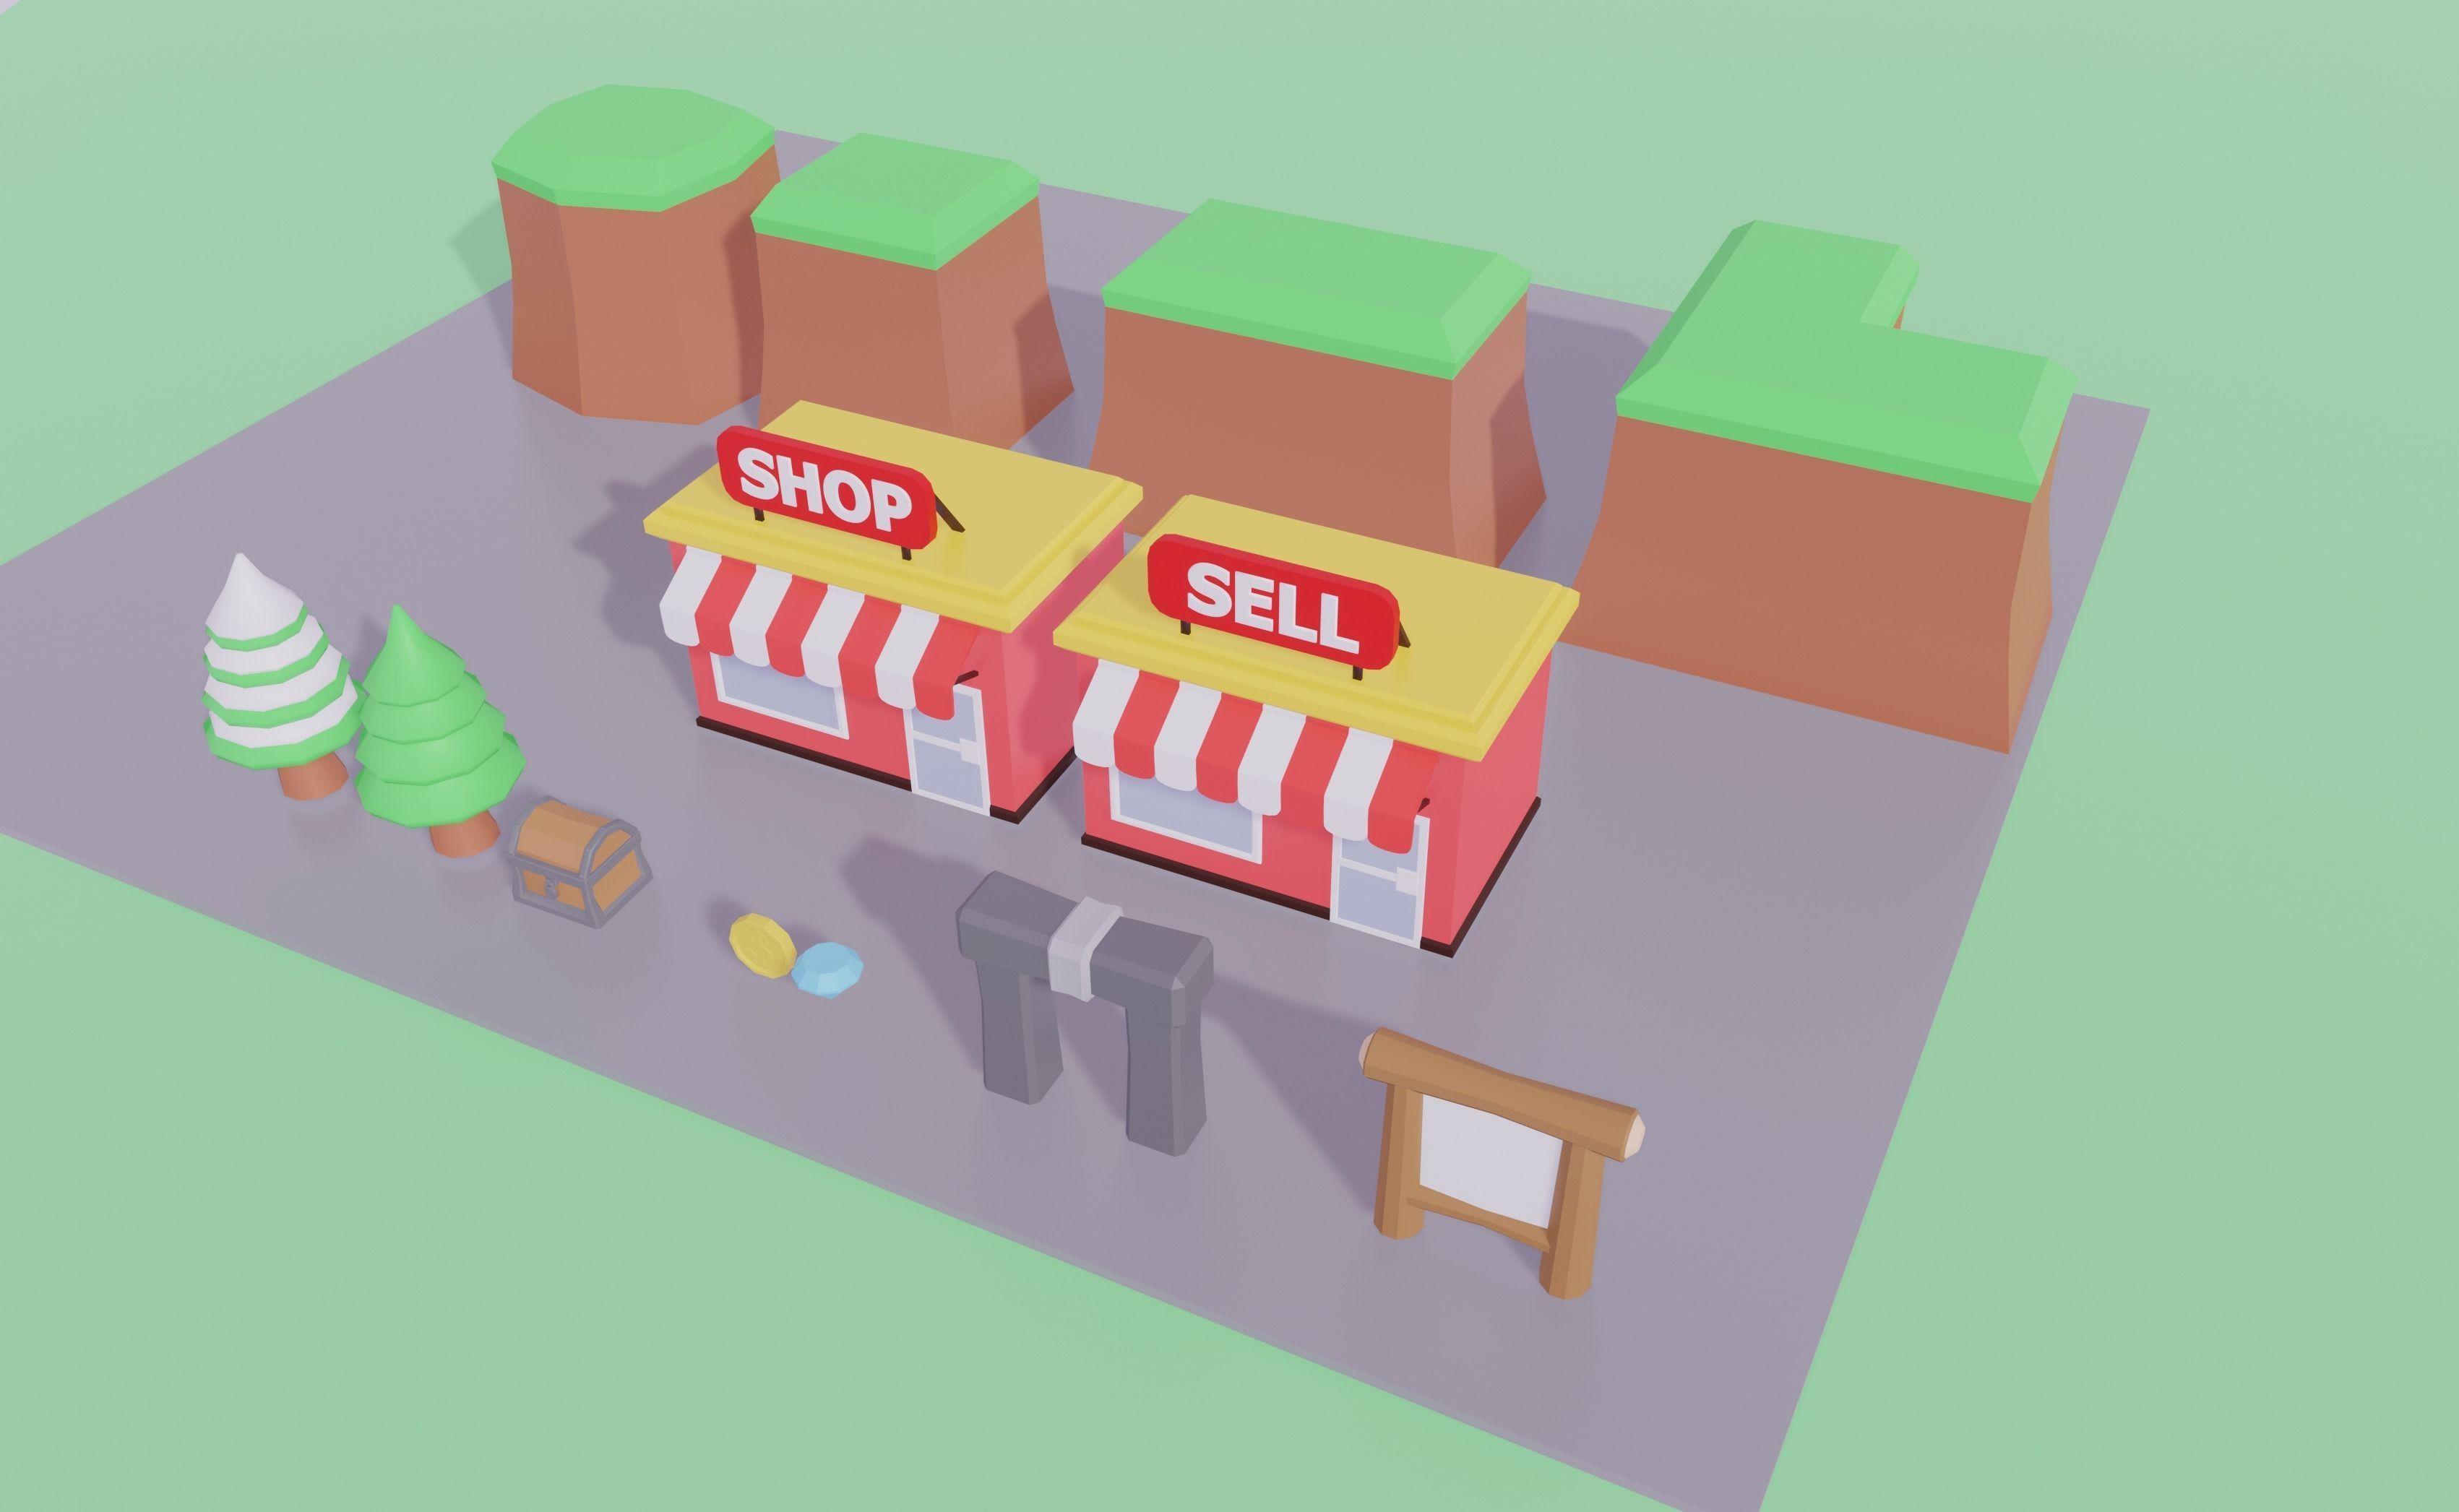 3D model Roblox Simulator Kit VR / AR / low-poly FBX BLEND